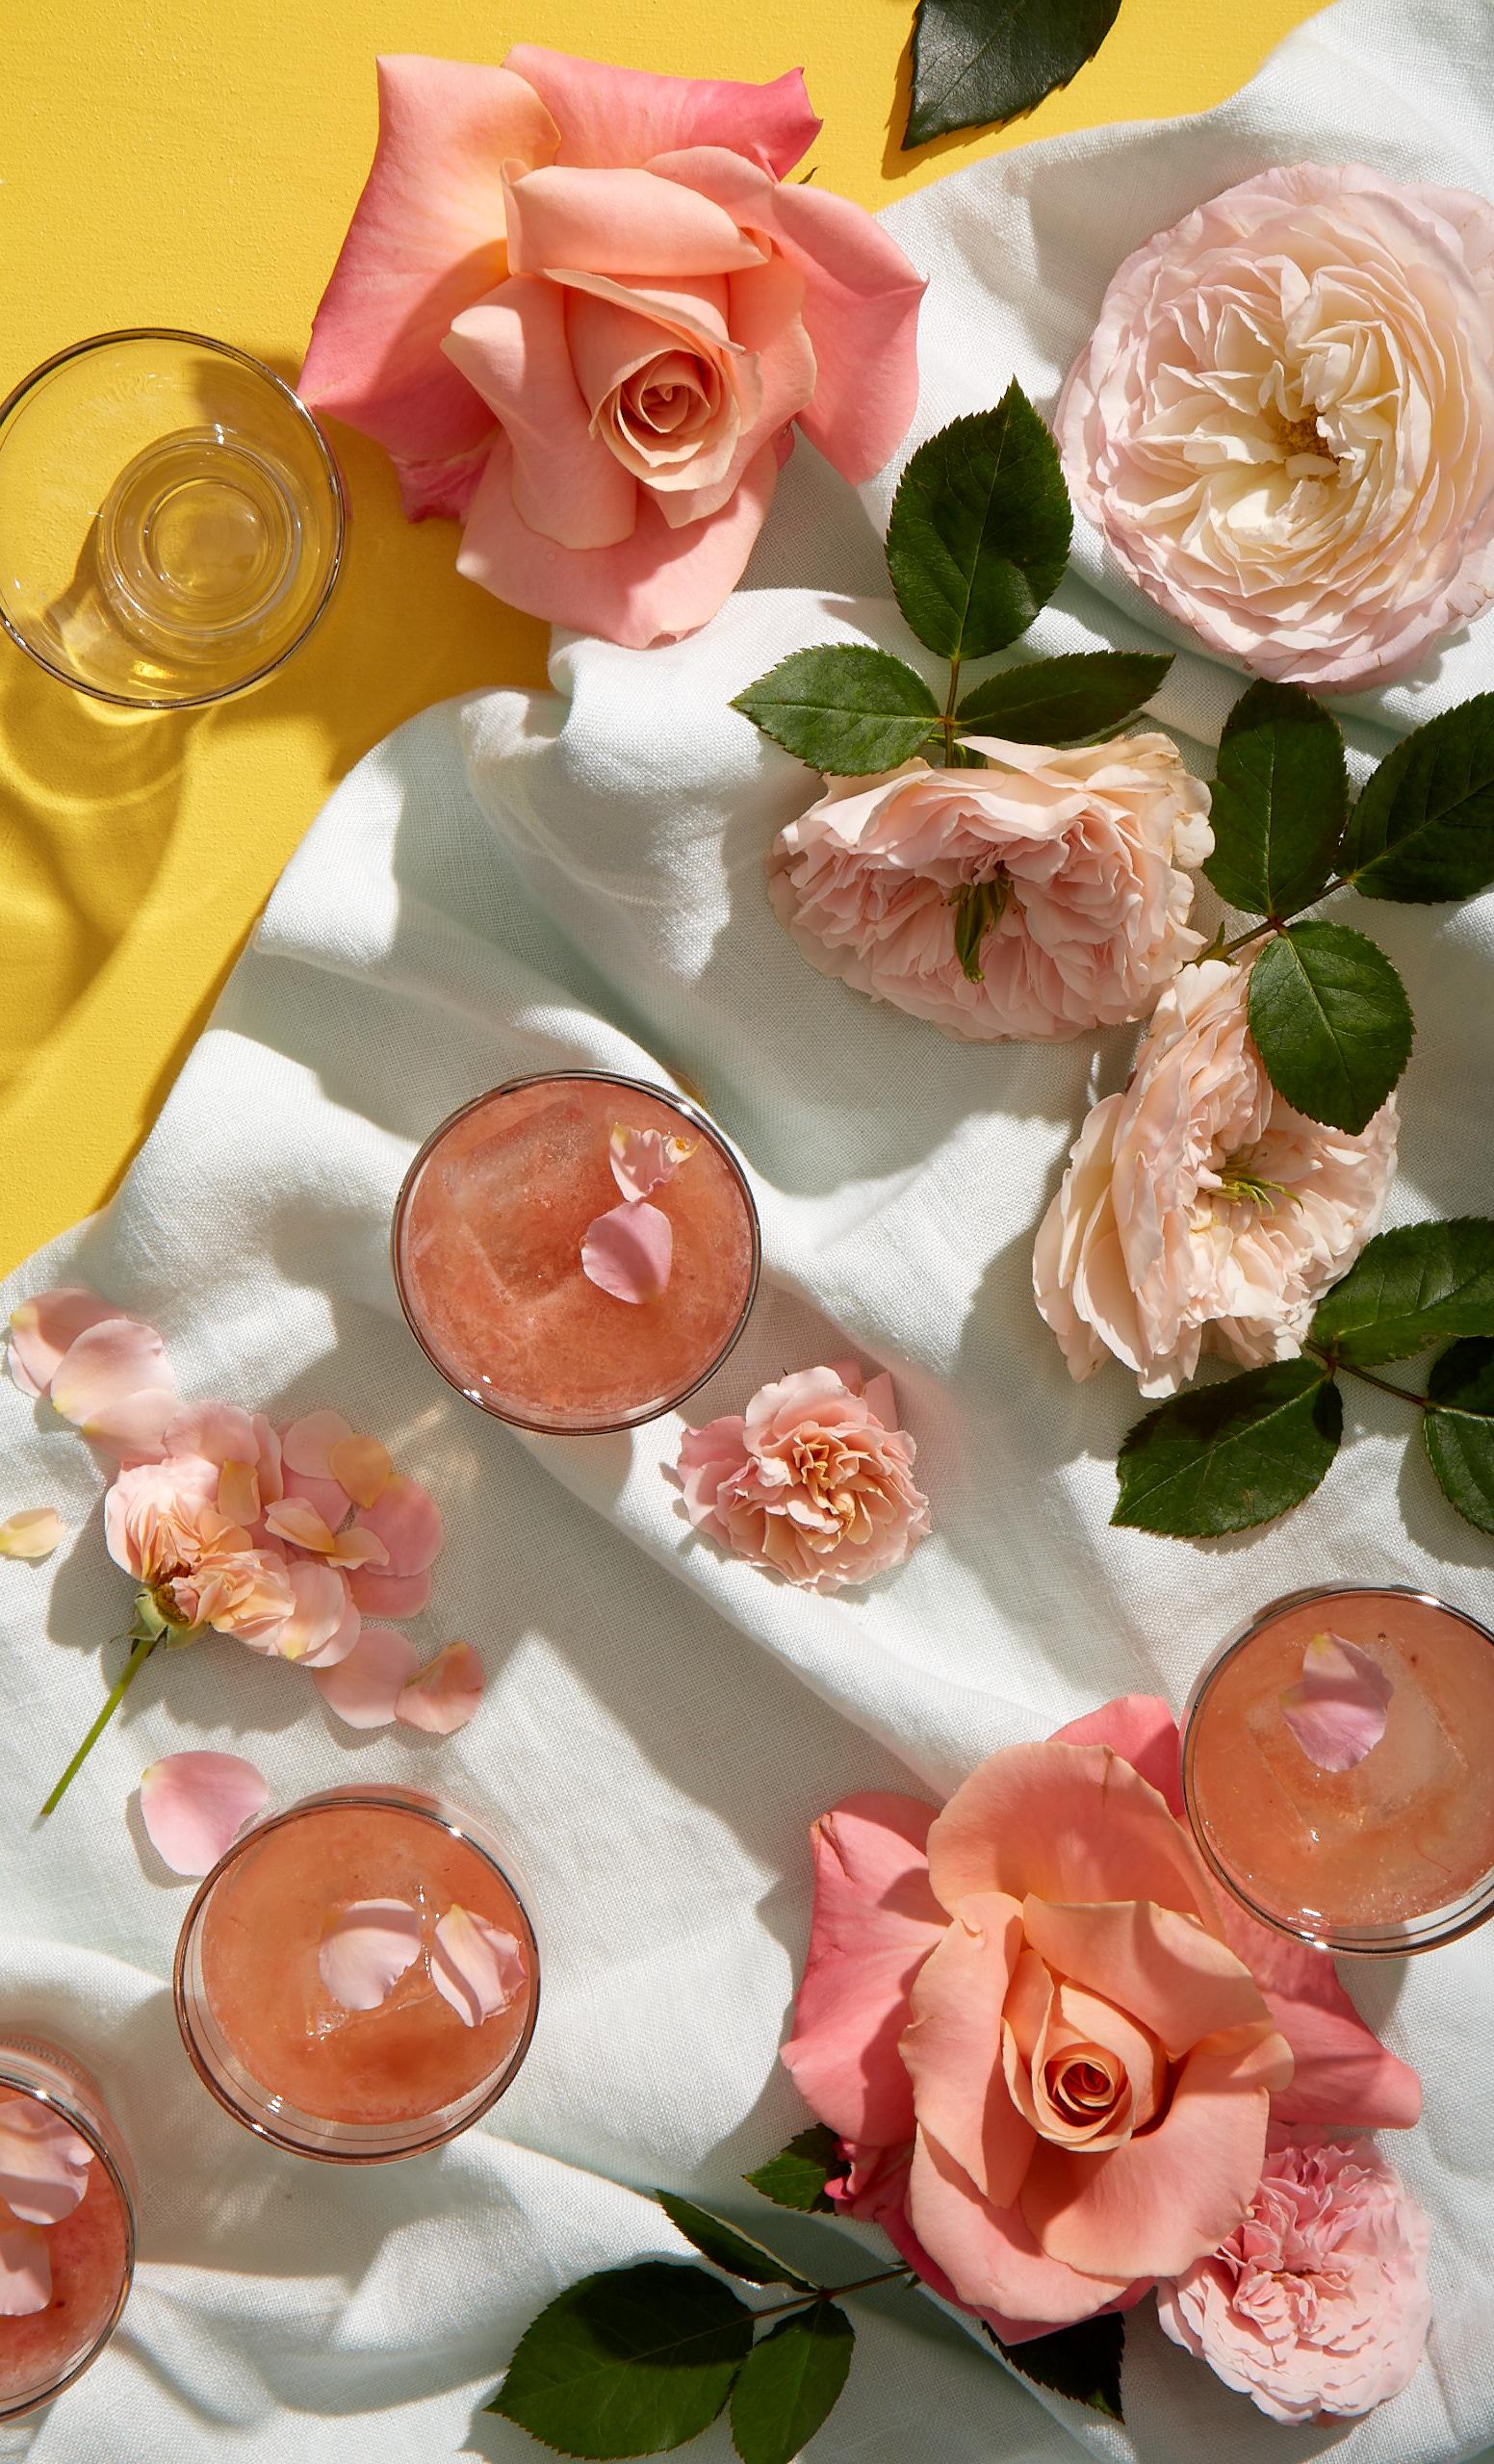 strawberry_rhubarb_rose_petal_whiskey_sour_hero.jpg